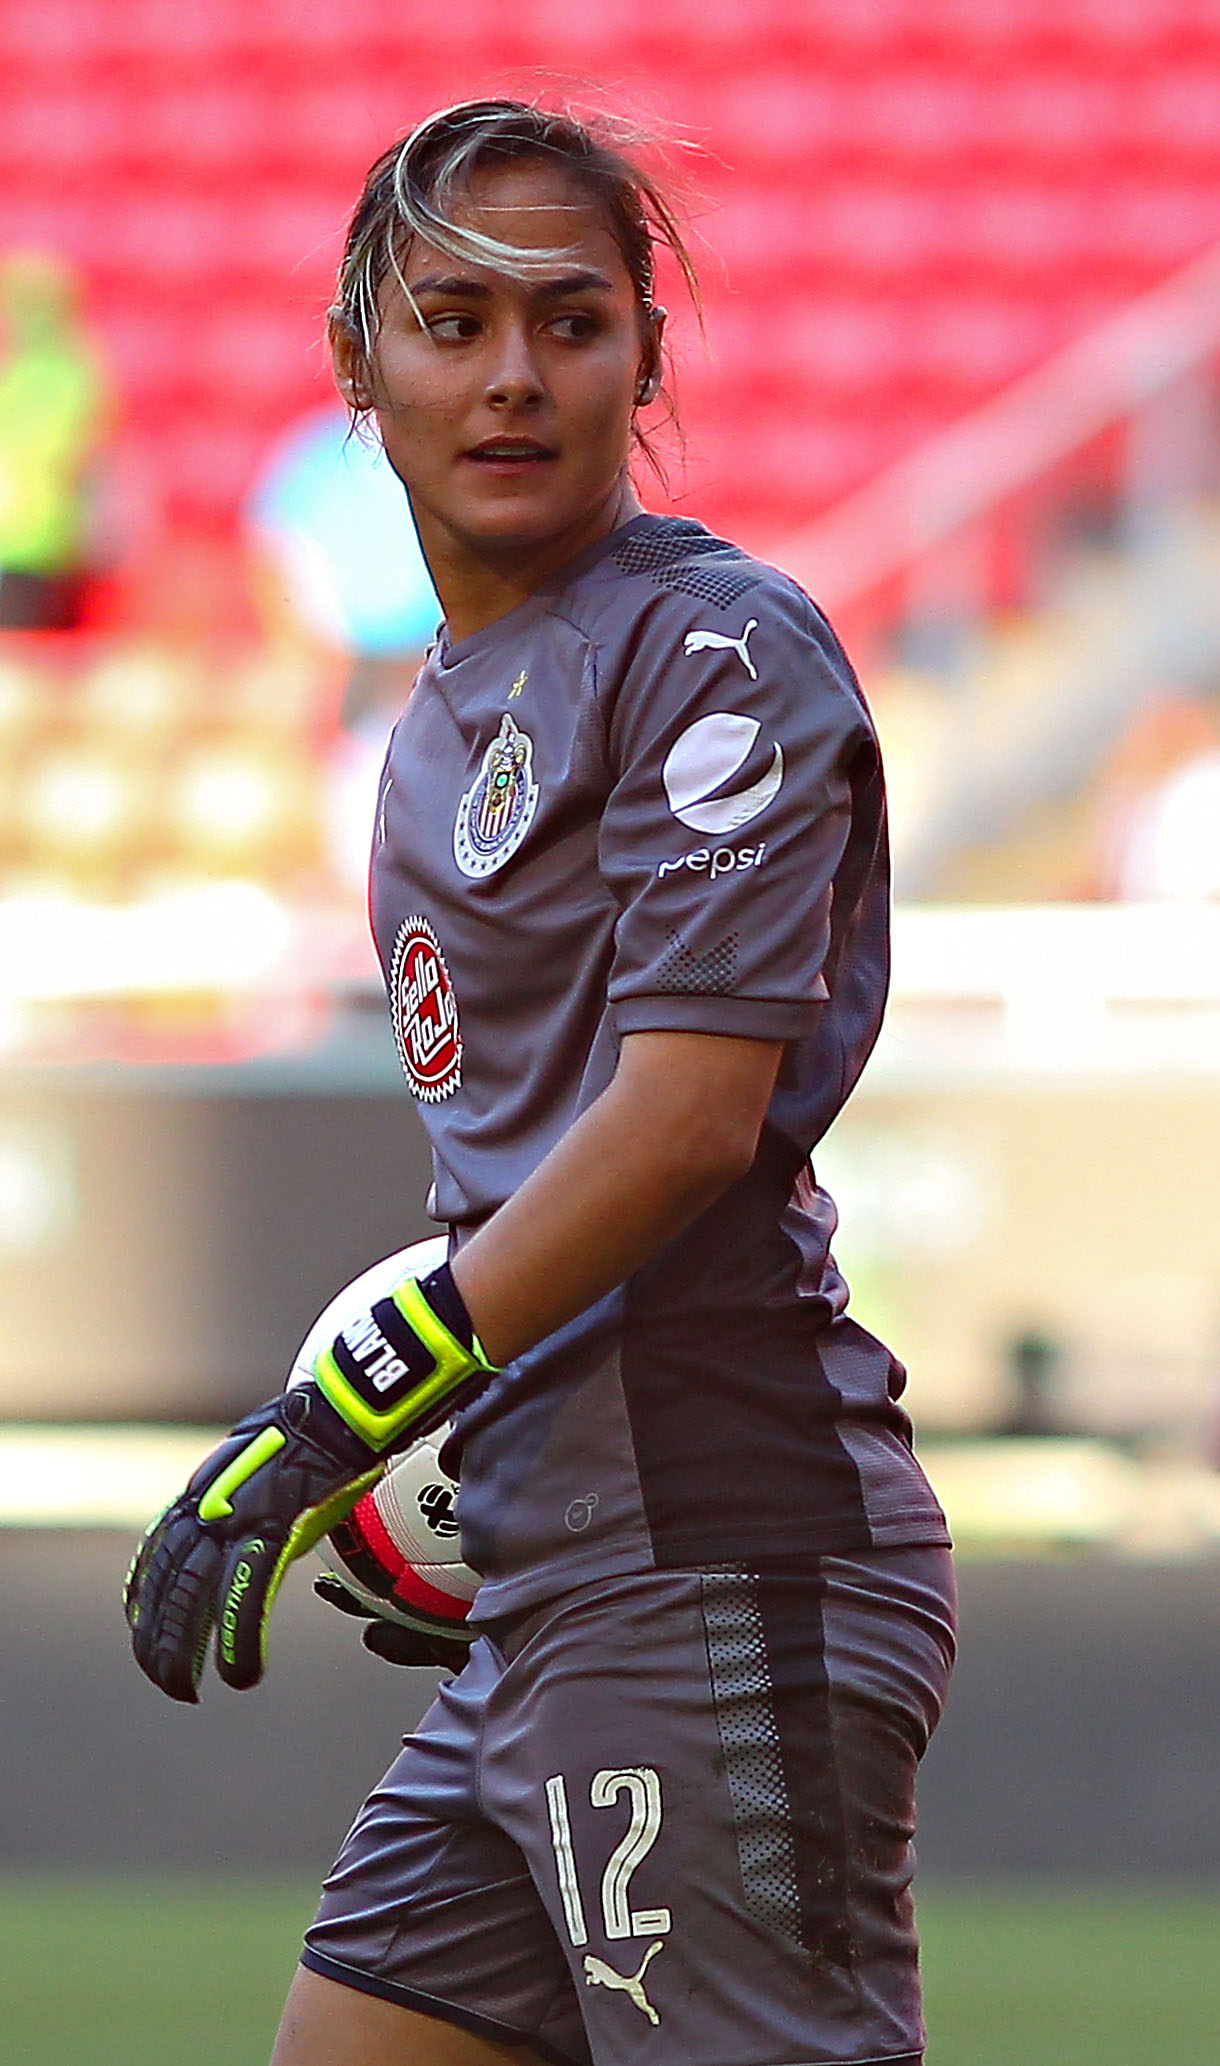 Blanca Félix, la guapa portera de las Chivas.